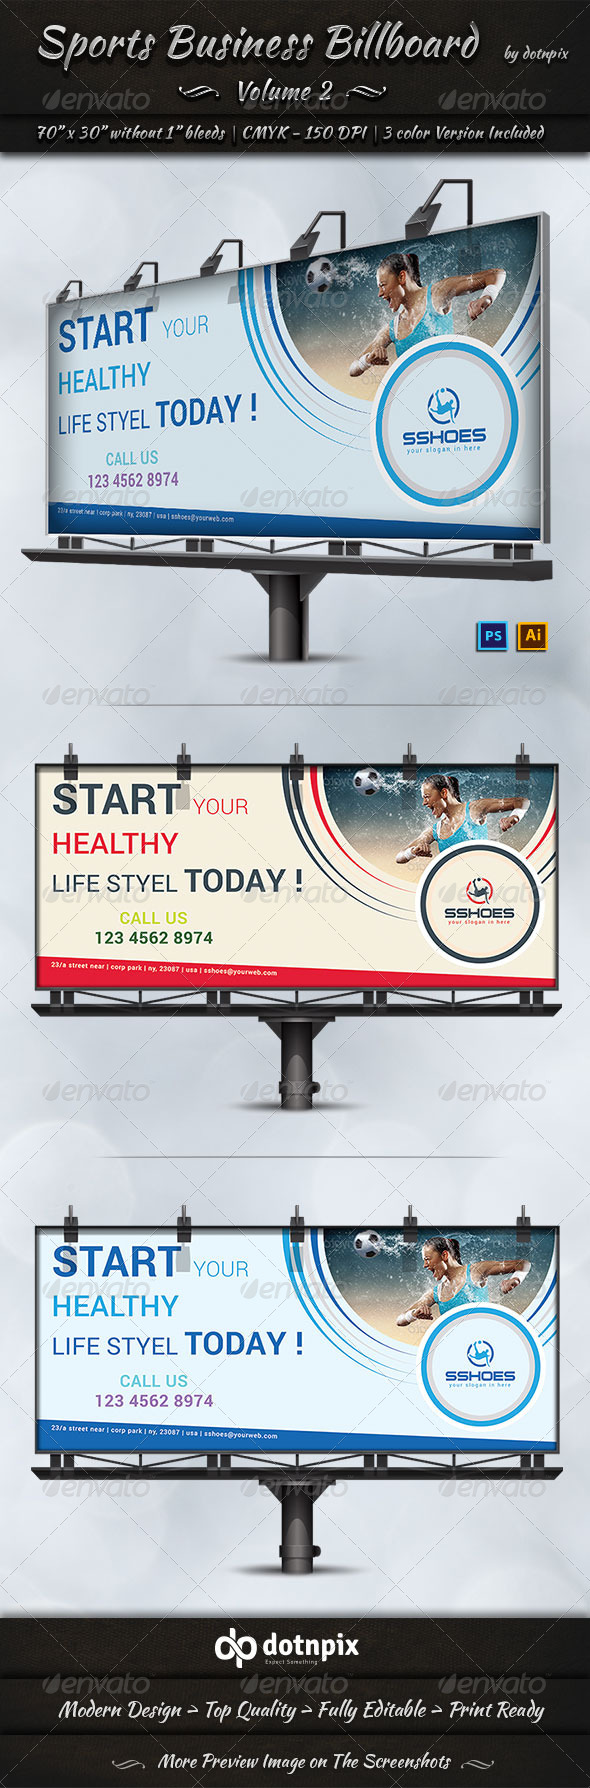 GraphicRiver Sports Business Billboard Volume 2 7783667